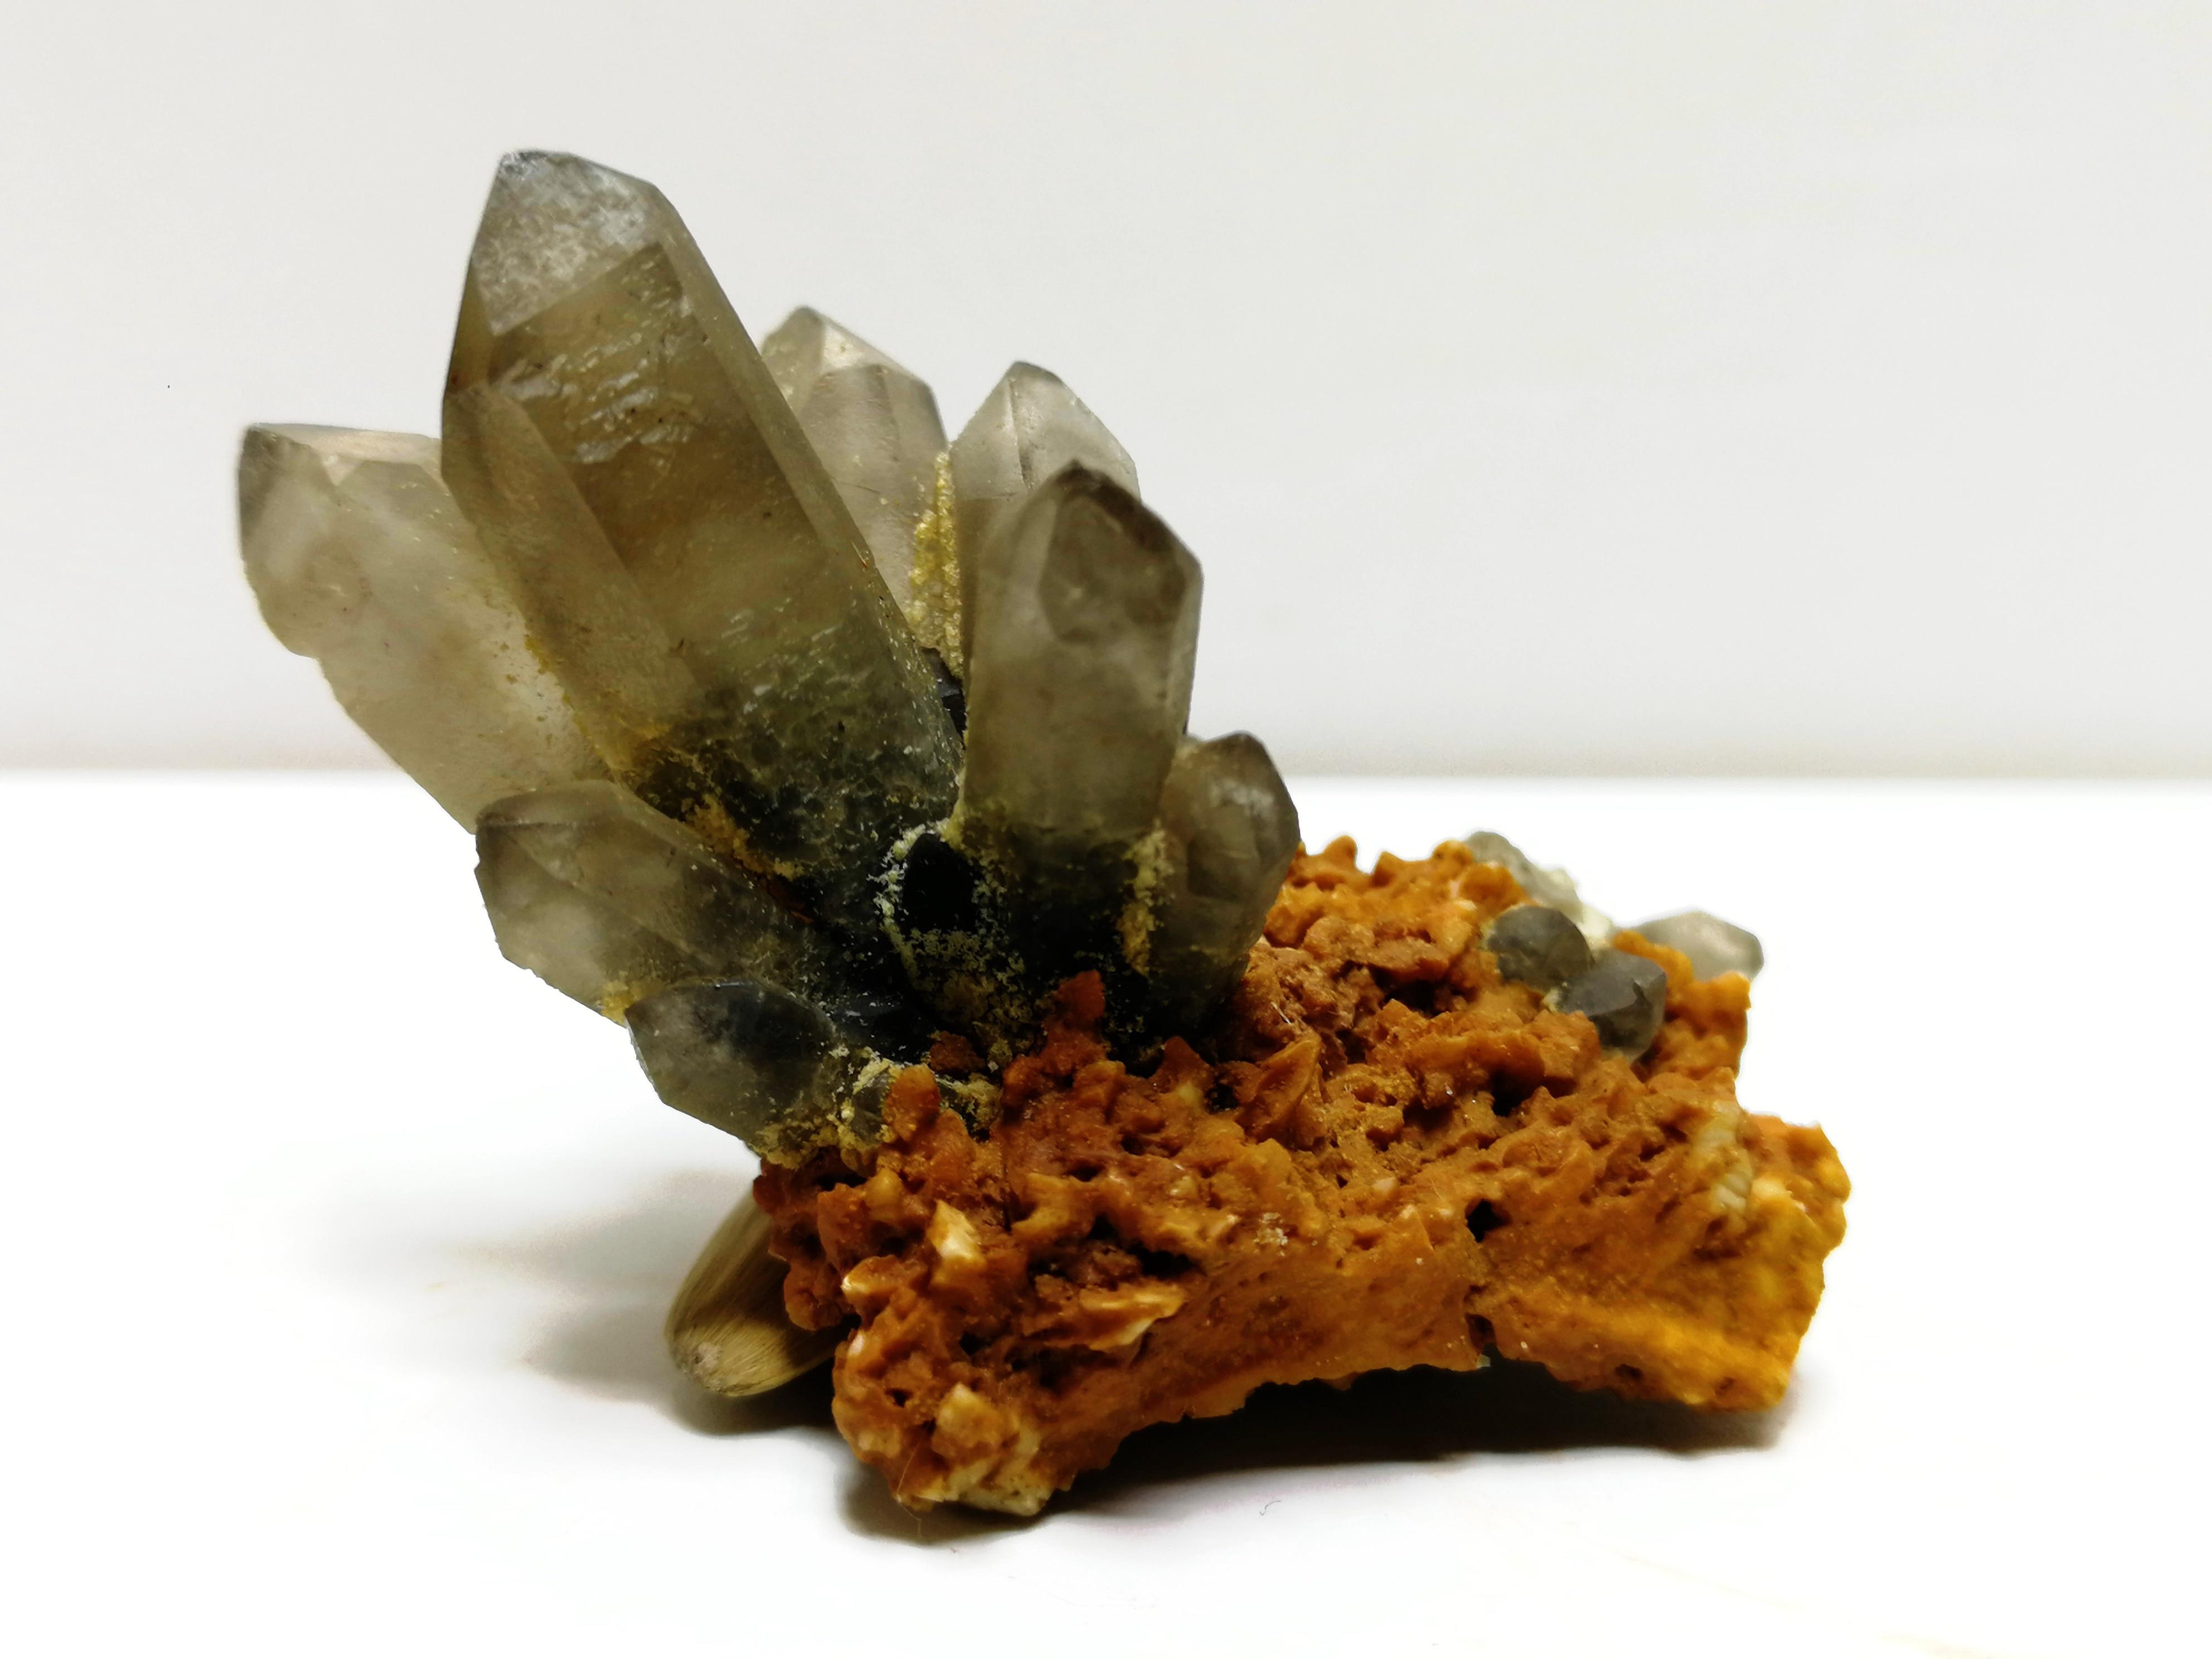 Ornamento da Mobília Gnatural Cristal Cluster Quartzo Mineral Espécime Energia Mágica Pedra 16.5